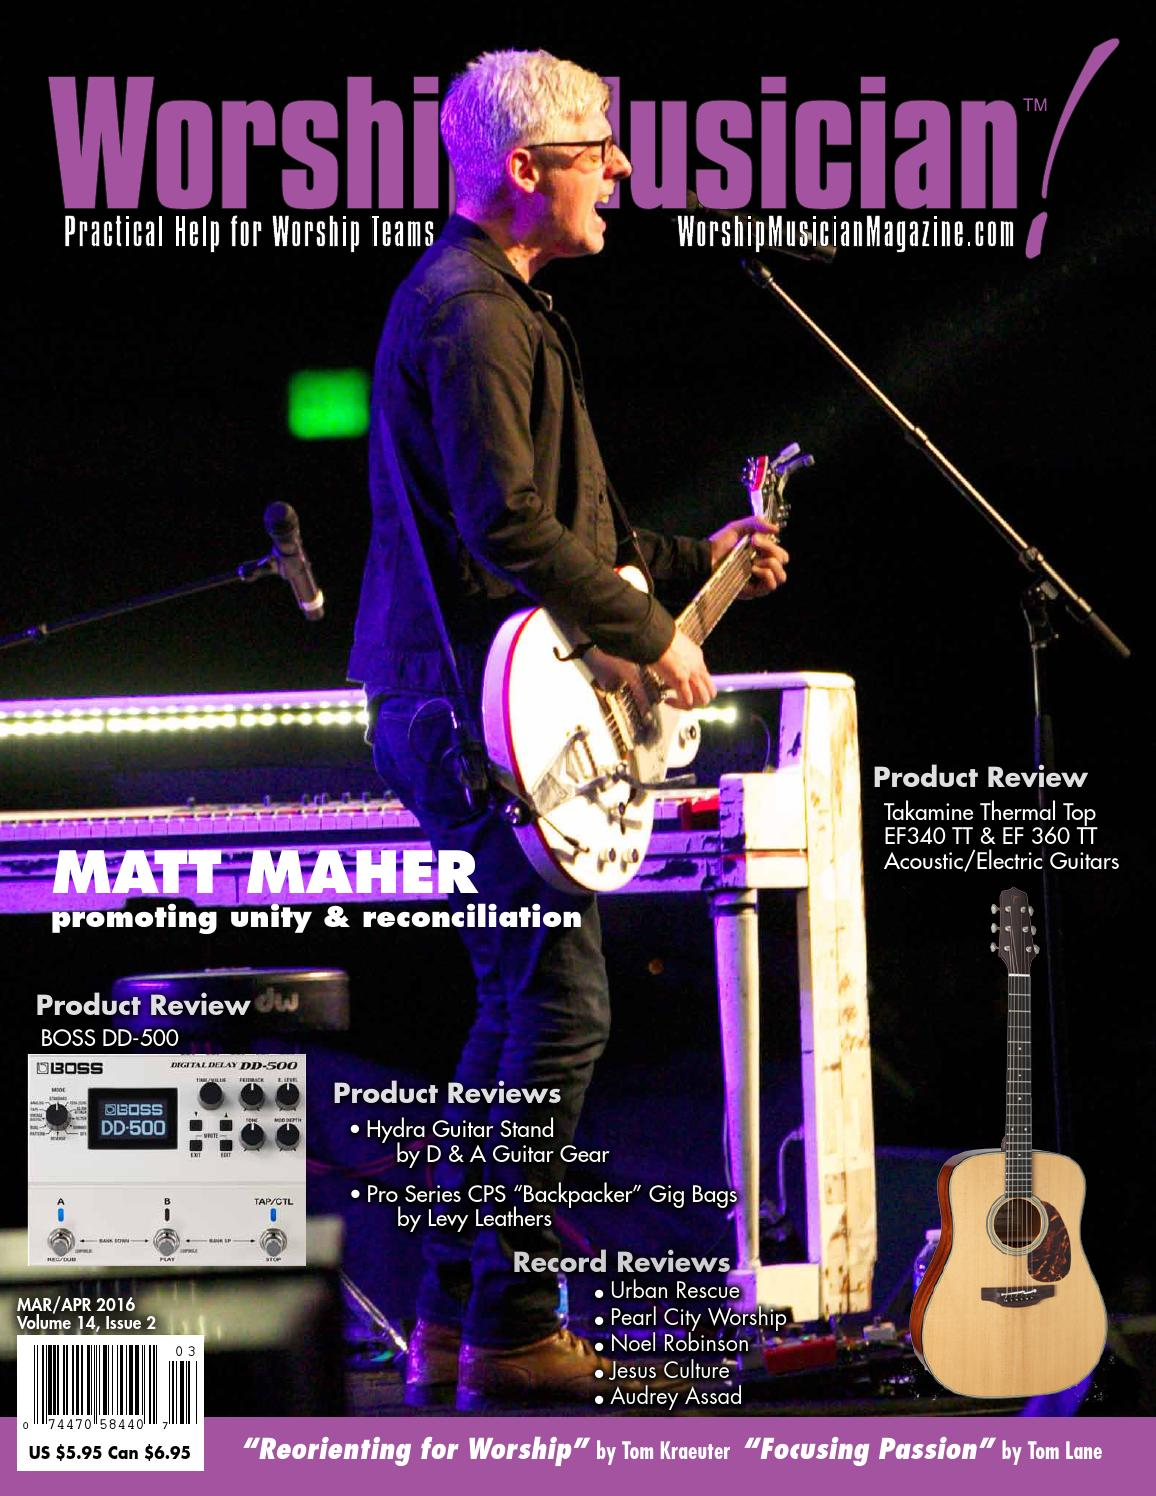 Worship Musician Magazine Marapr 2016 By Worship Musician